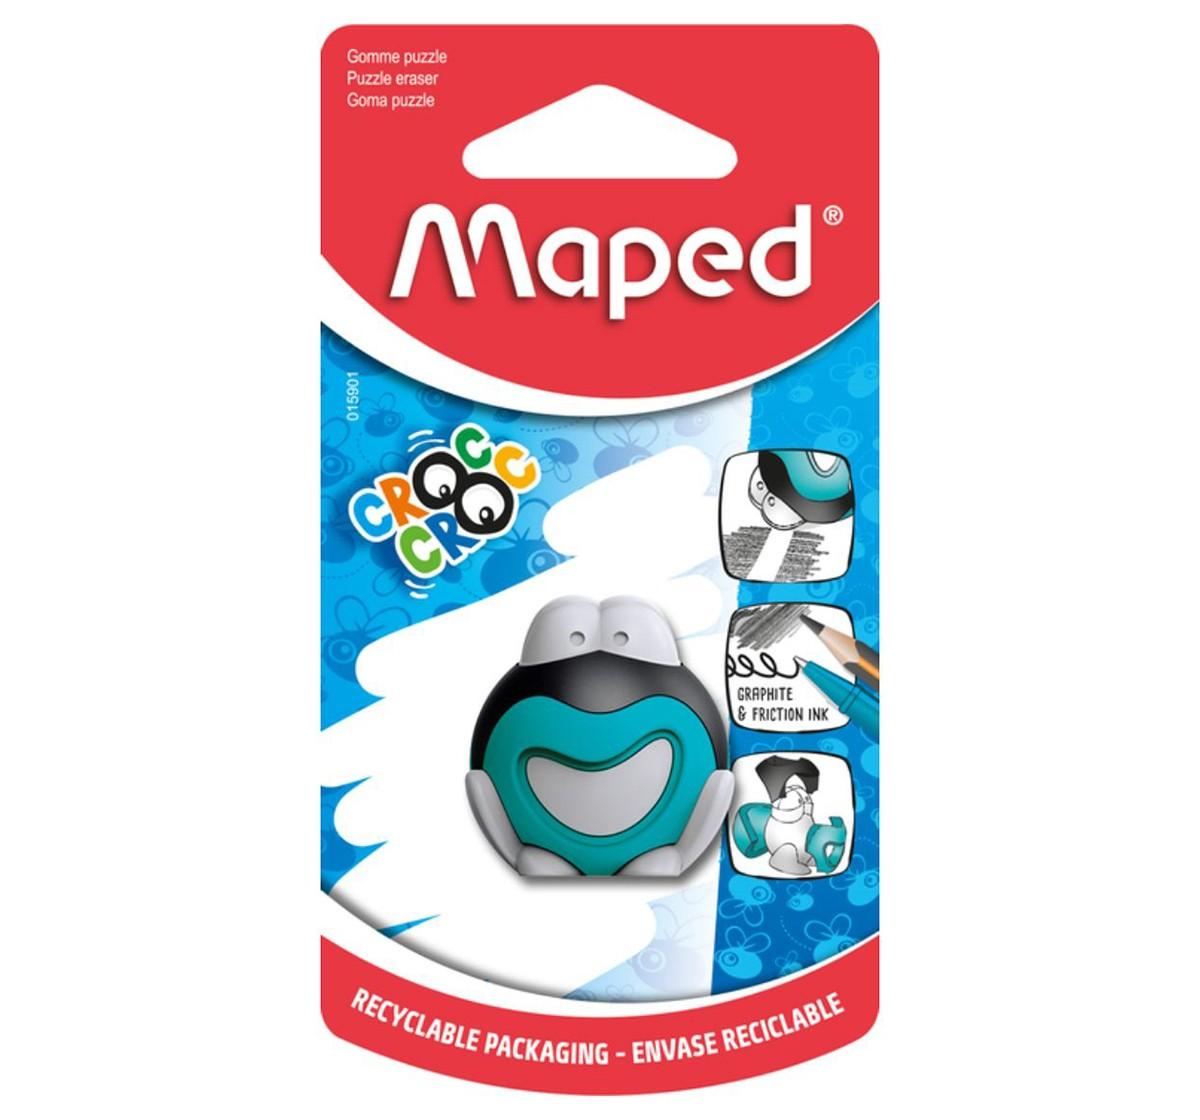 Maped Croc Puzzle Frog Eraser, Unisex 7Y+ (Blue)